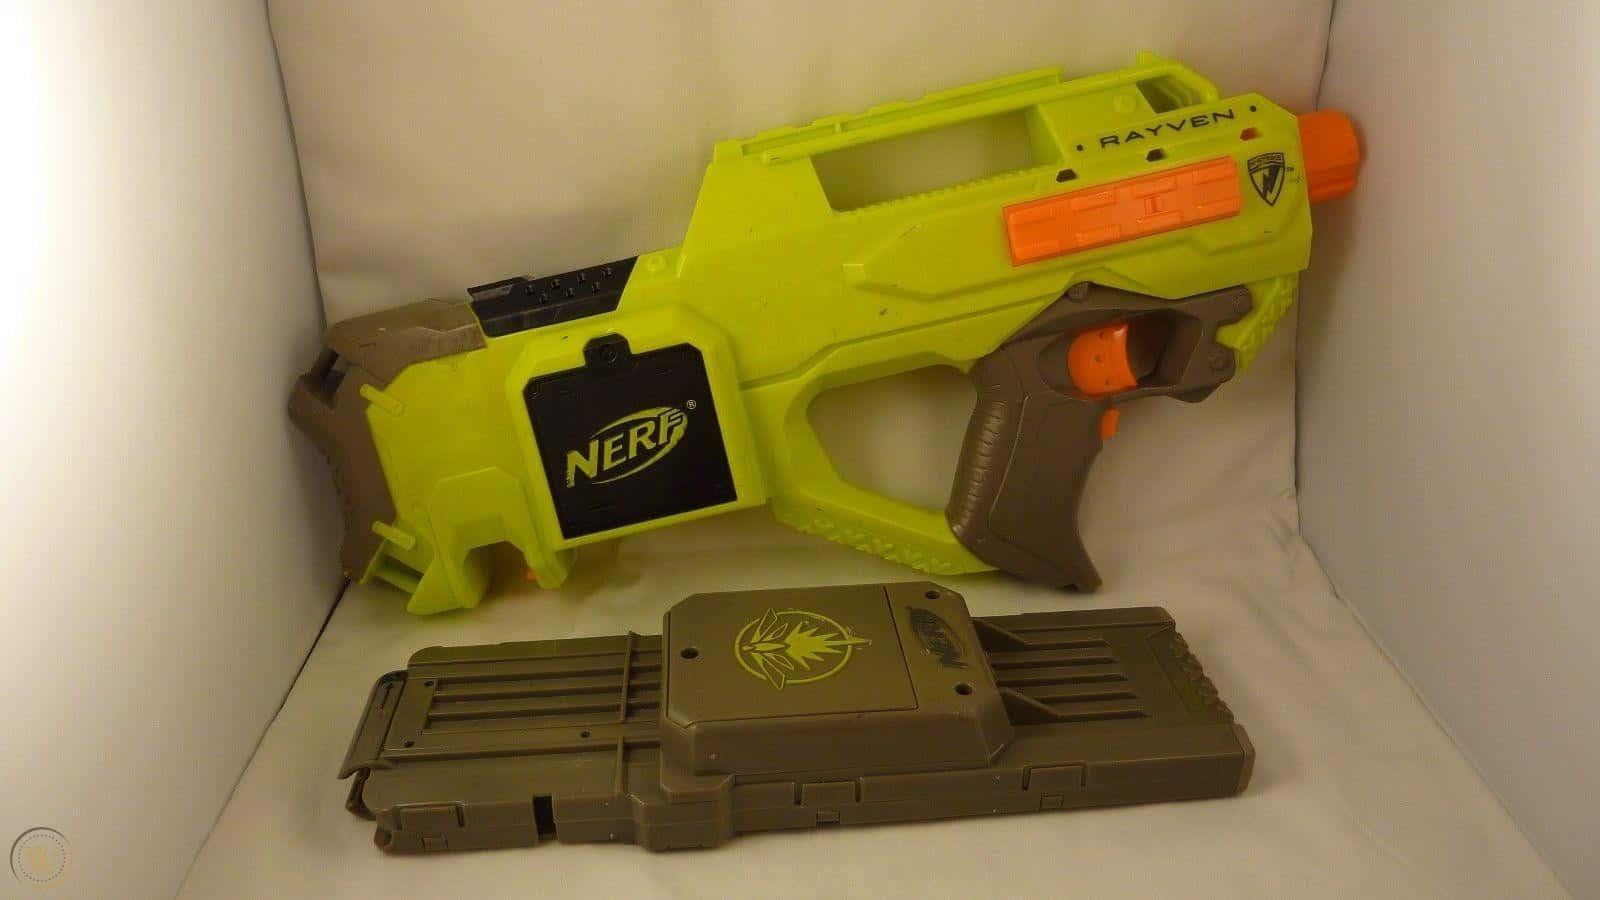 Most Expensive Nerf Guns - Nerf Rayven CS-18 (Light It Up Series) - $200